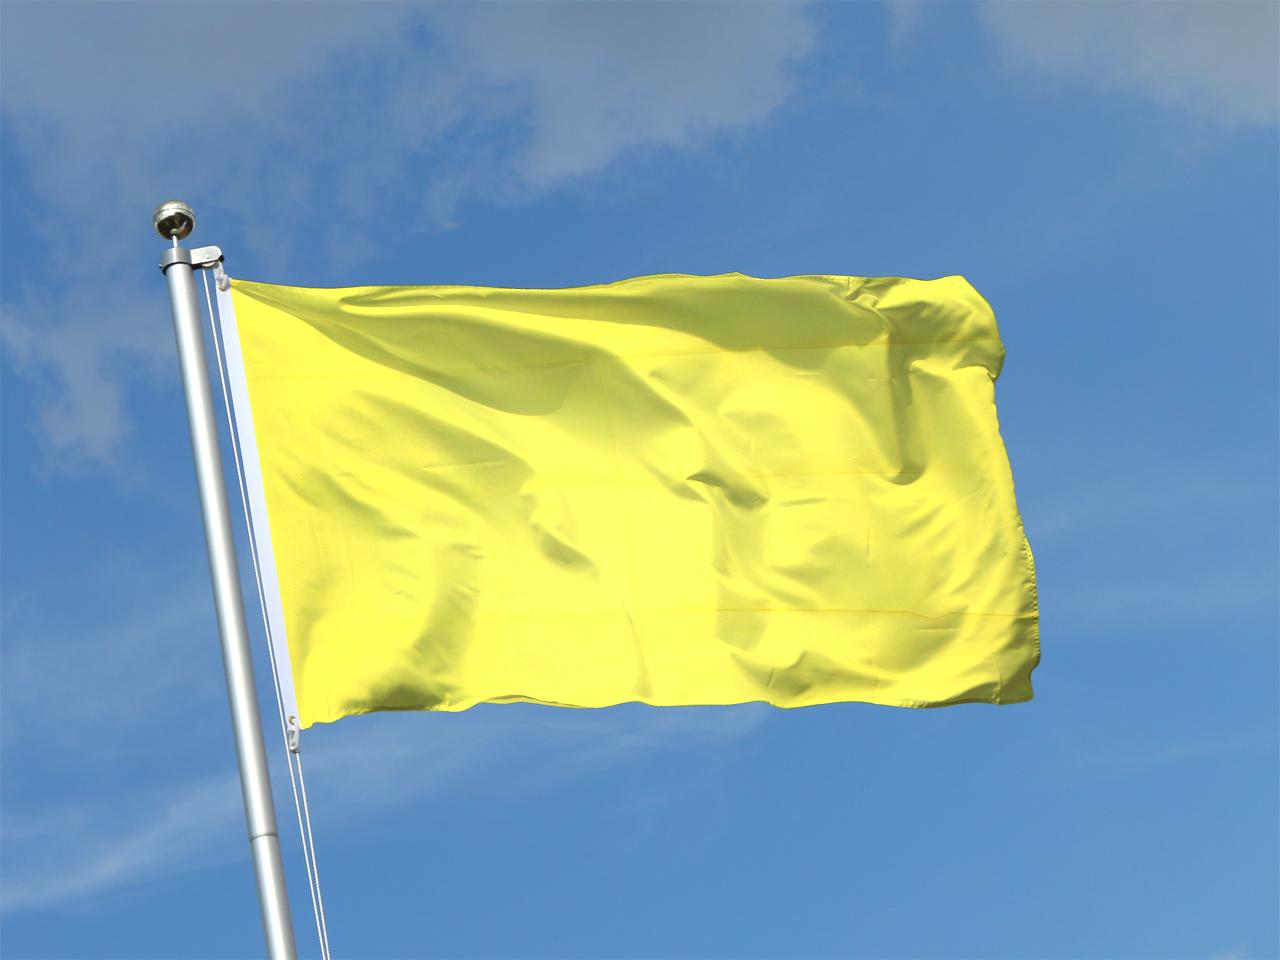 einfarbig gelbe flagge 90 x 150 cm kaufen fahnen ch. Black Bedroom Furniture Sets. Home Design Ideas